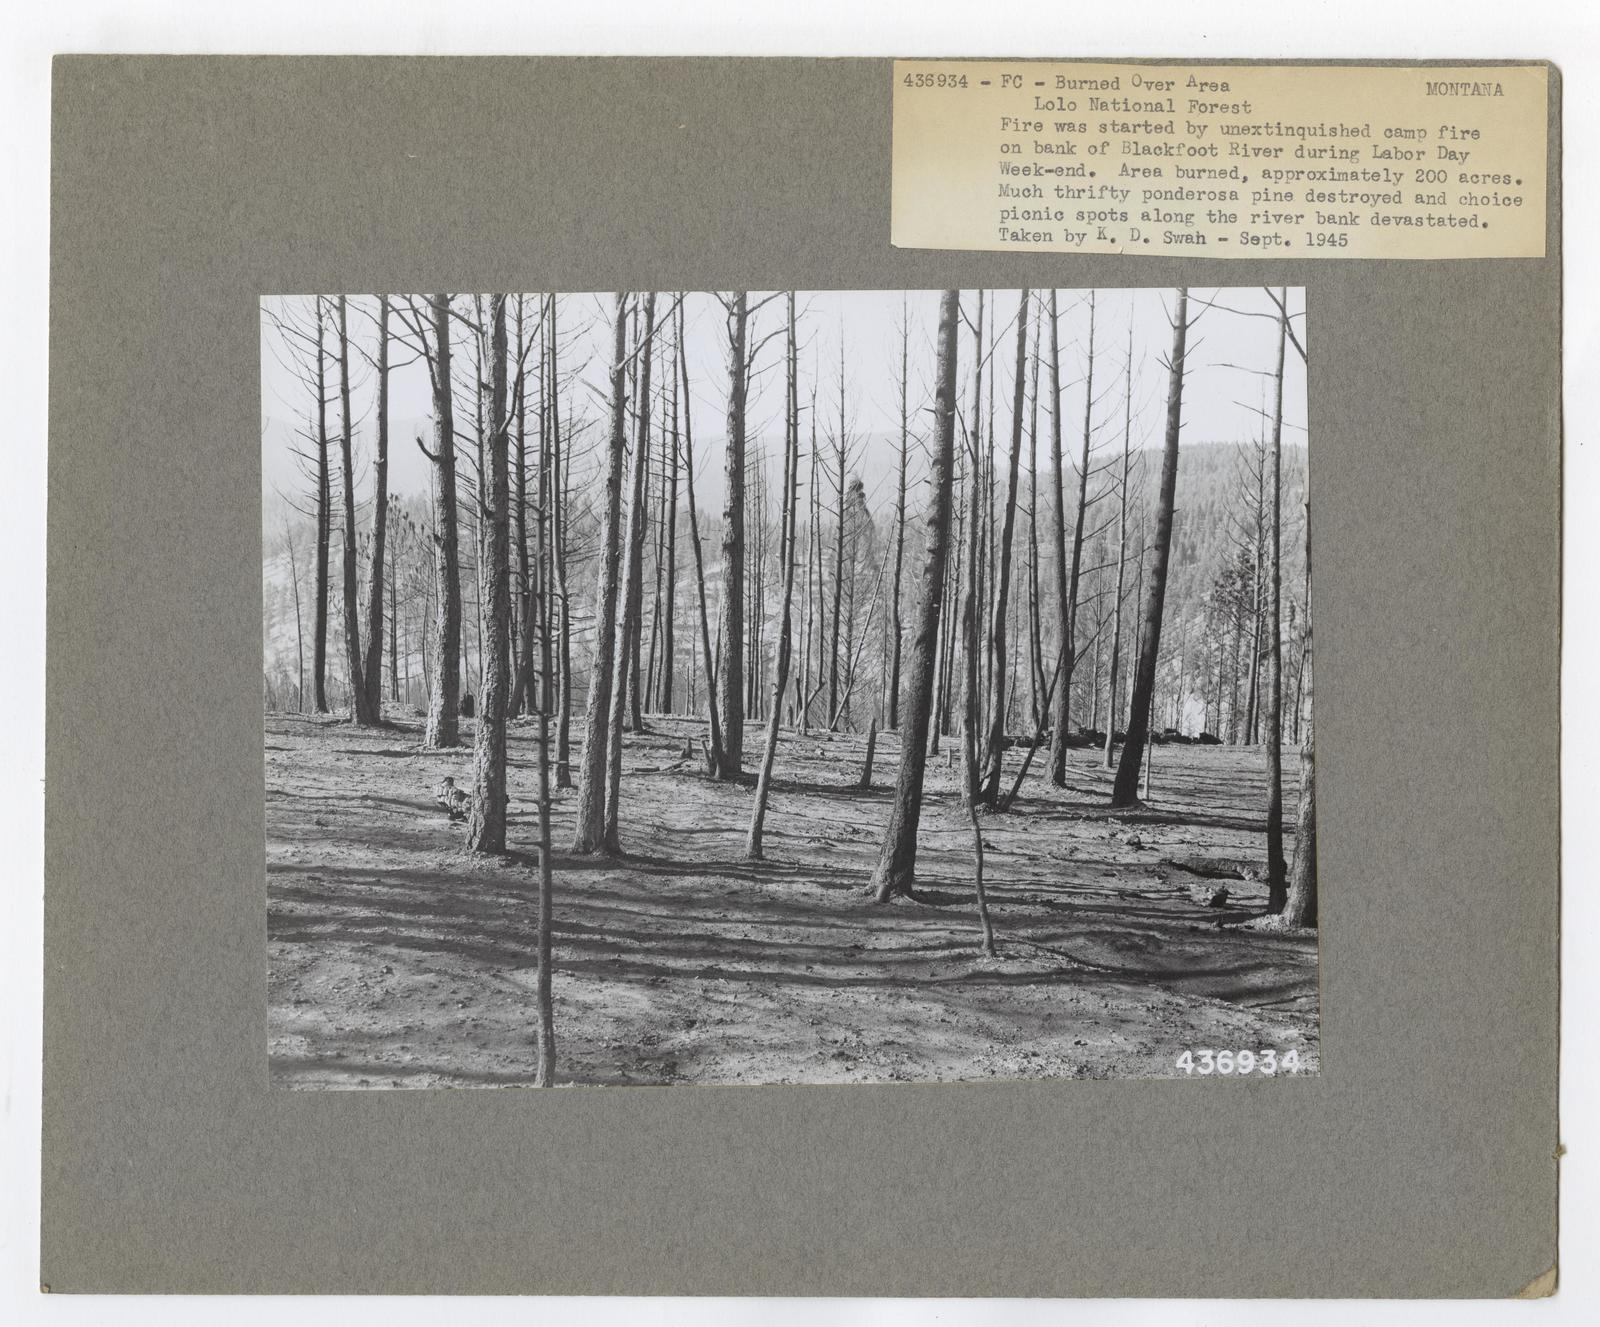 Burned -Over Areas - Montana